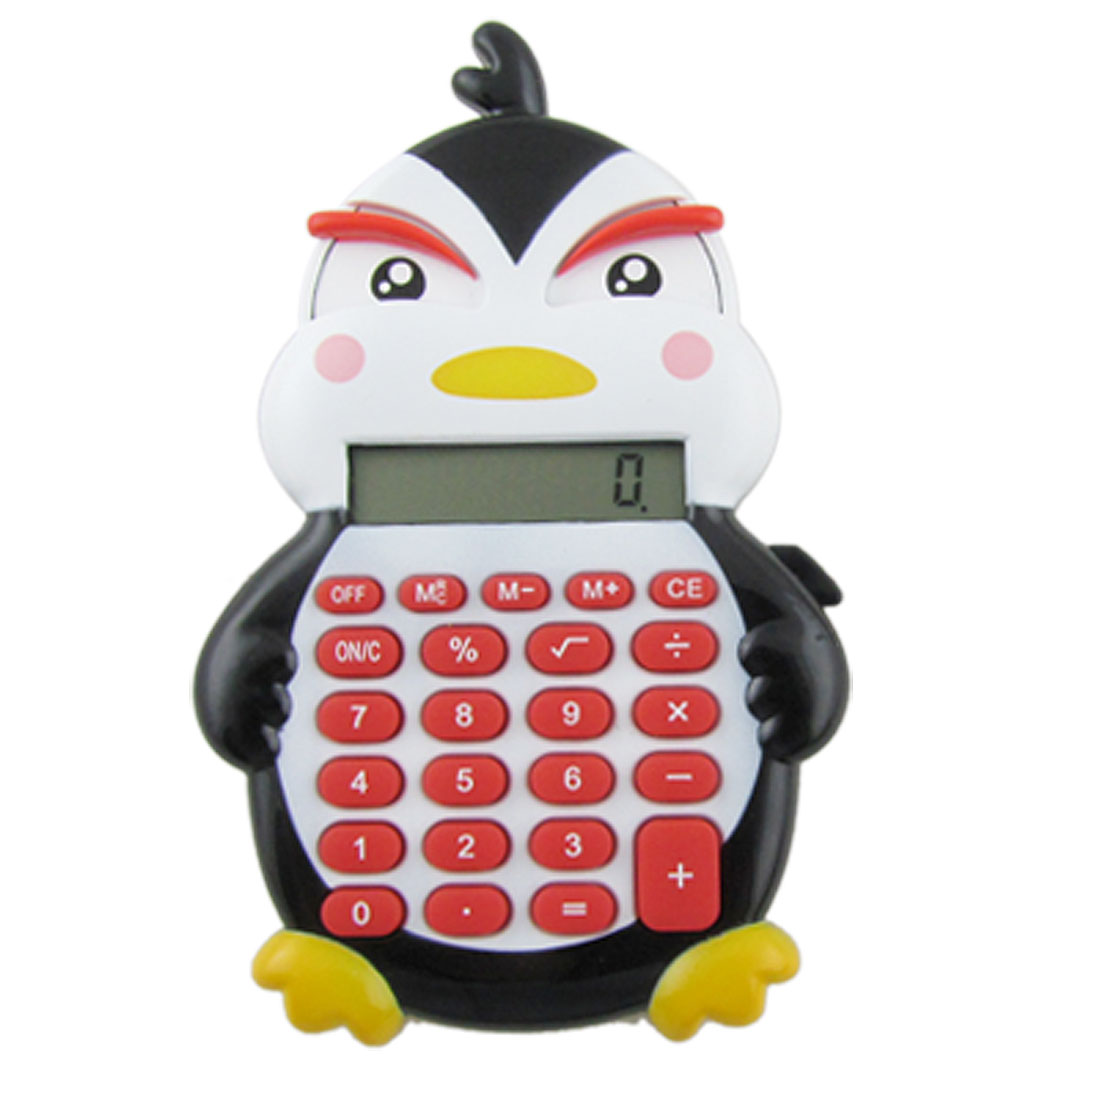 Plastic Keypad 8 Digits Duck Design Electronic Calculator Black